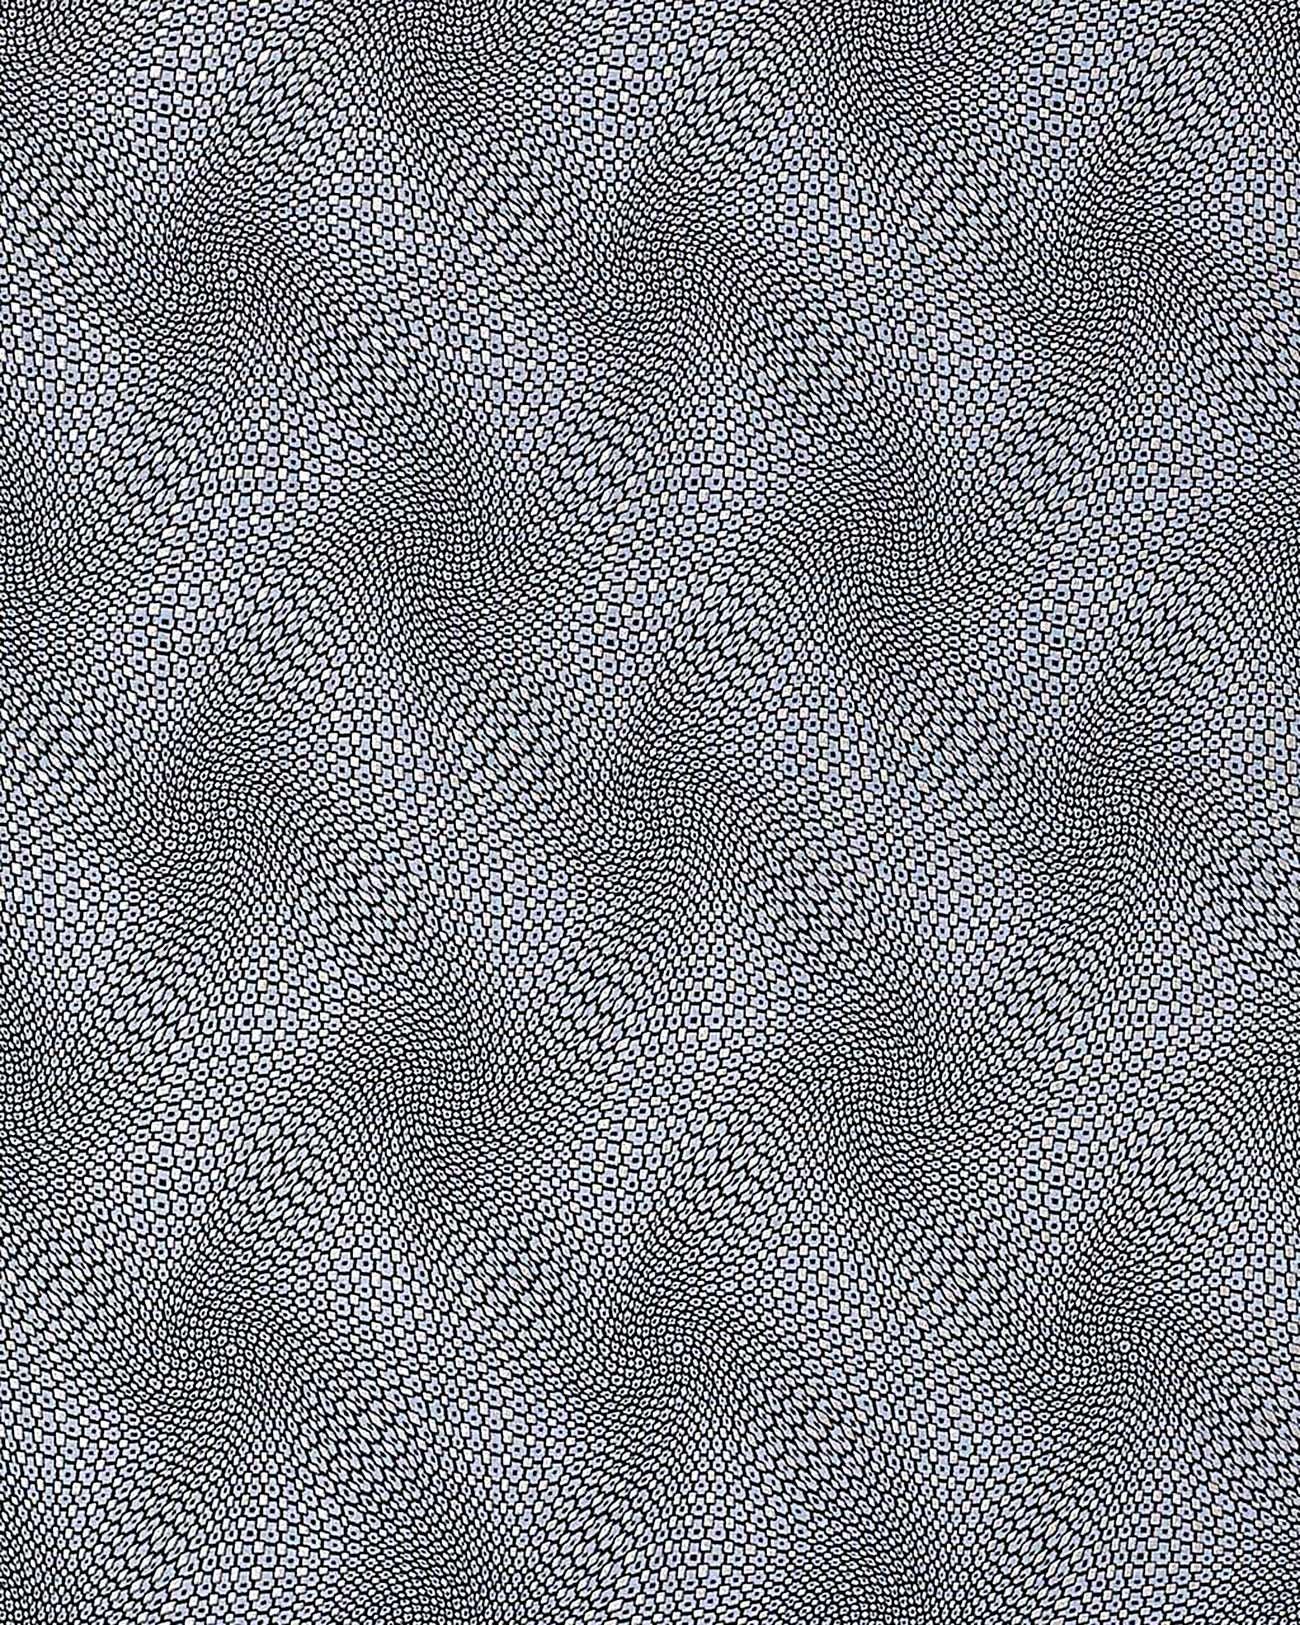 gray wallpaper deals on 1001 blocks. Black Bedroom Furniture Sets. Home Design Ideas